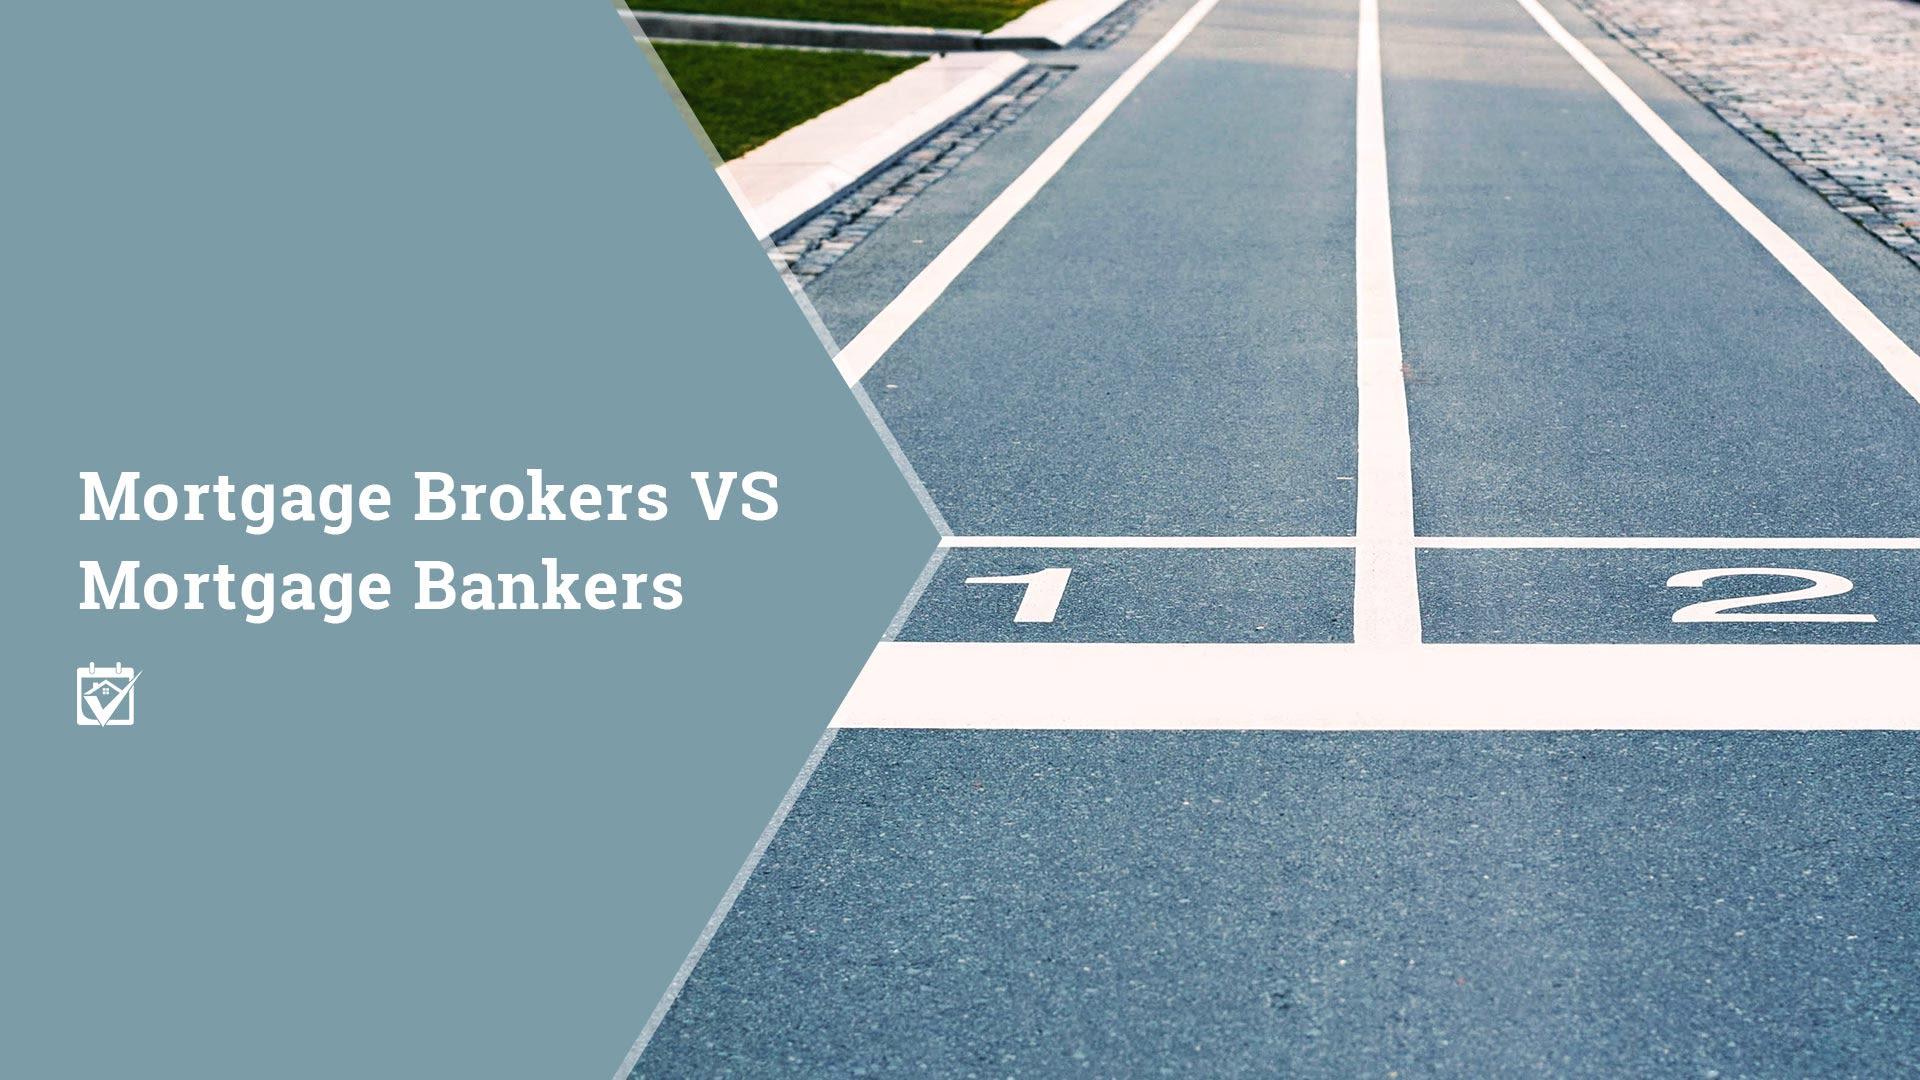 Mortgage Brokers vs. Mortgage Bankers